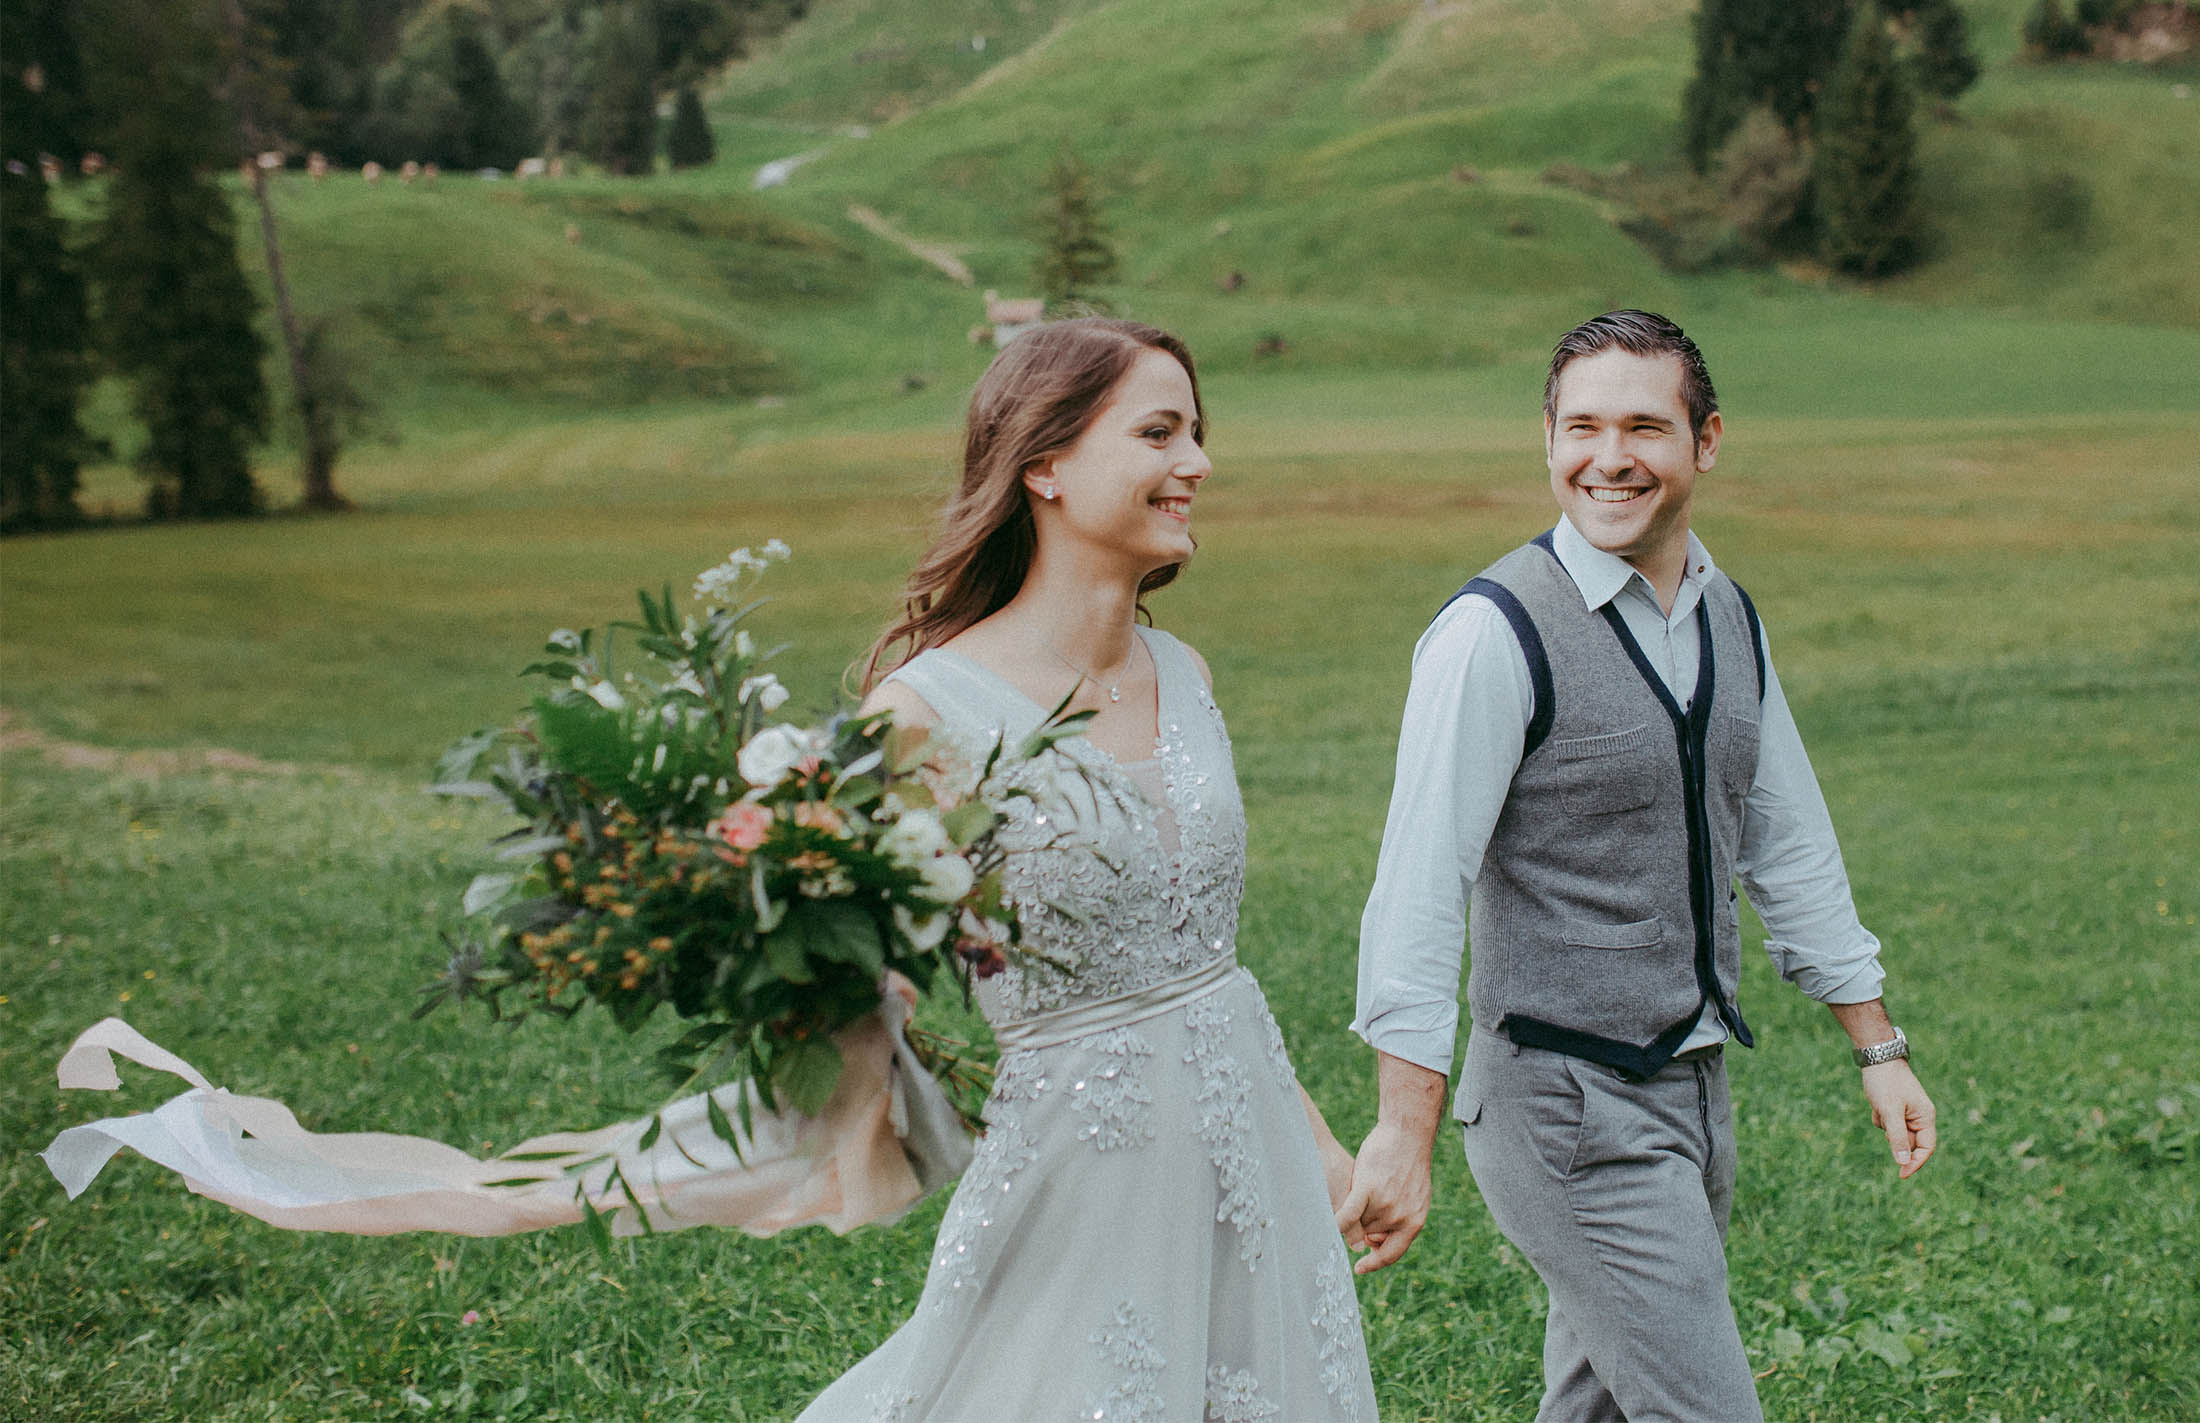 Hochzeitsfotografin Anastasia Gerasimova